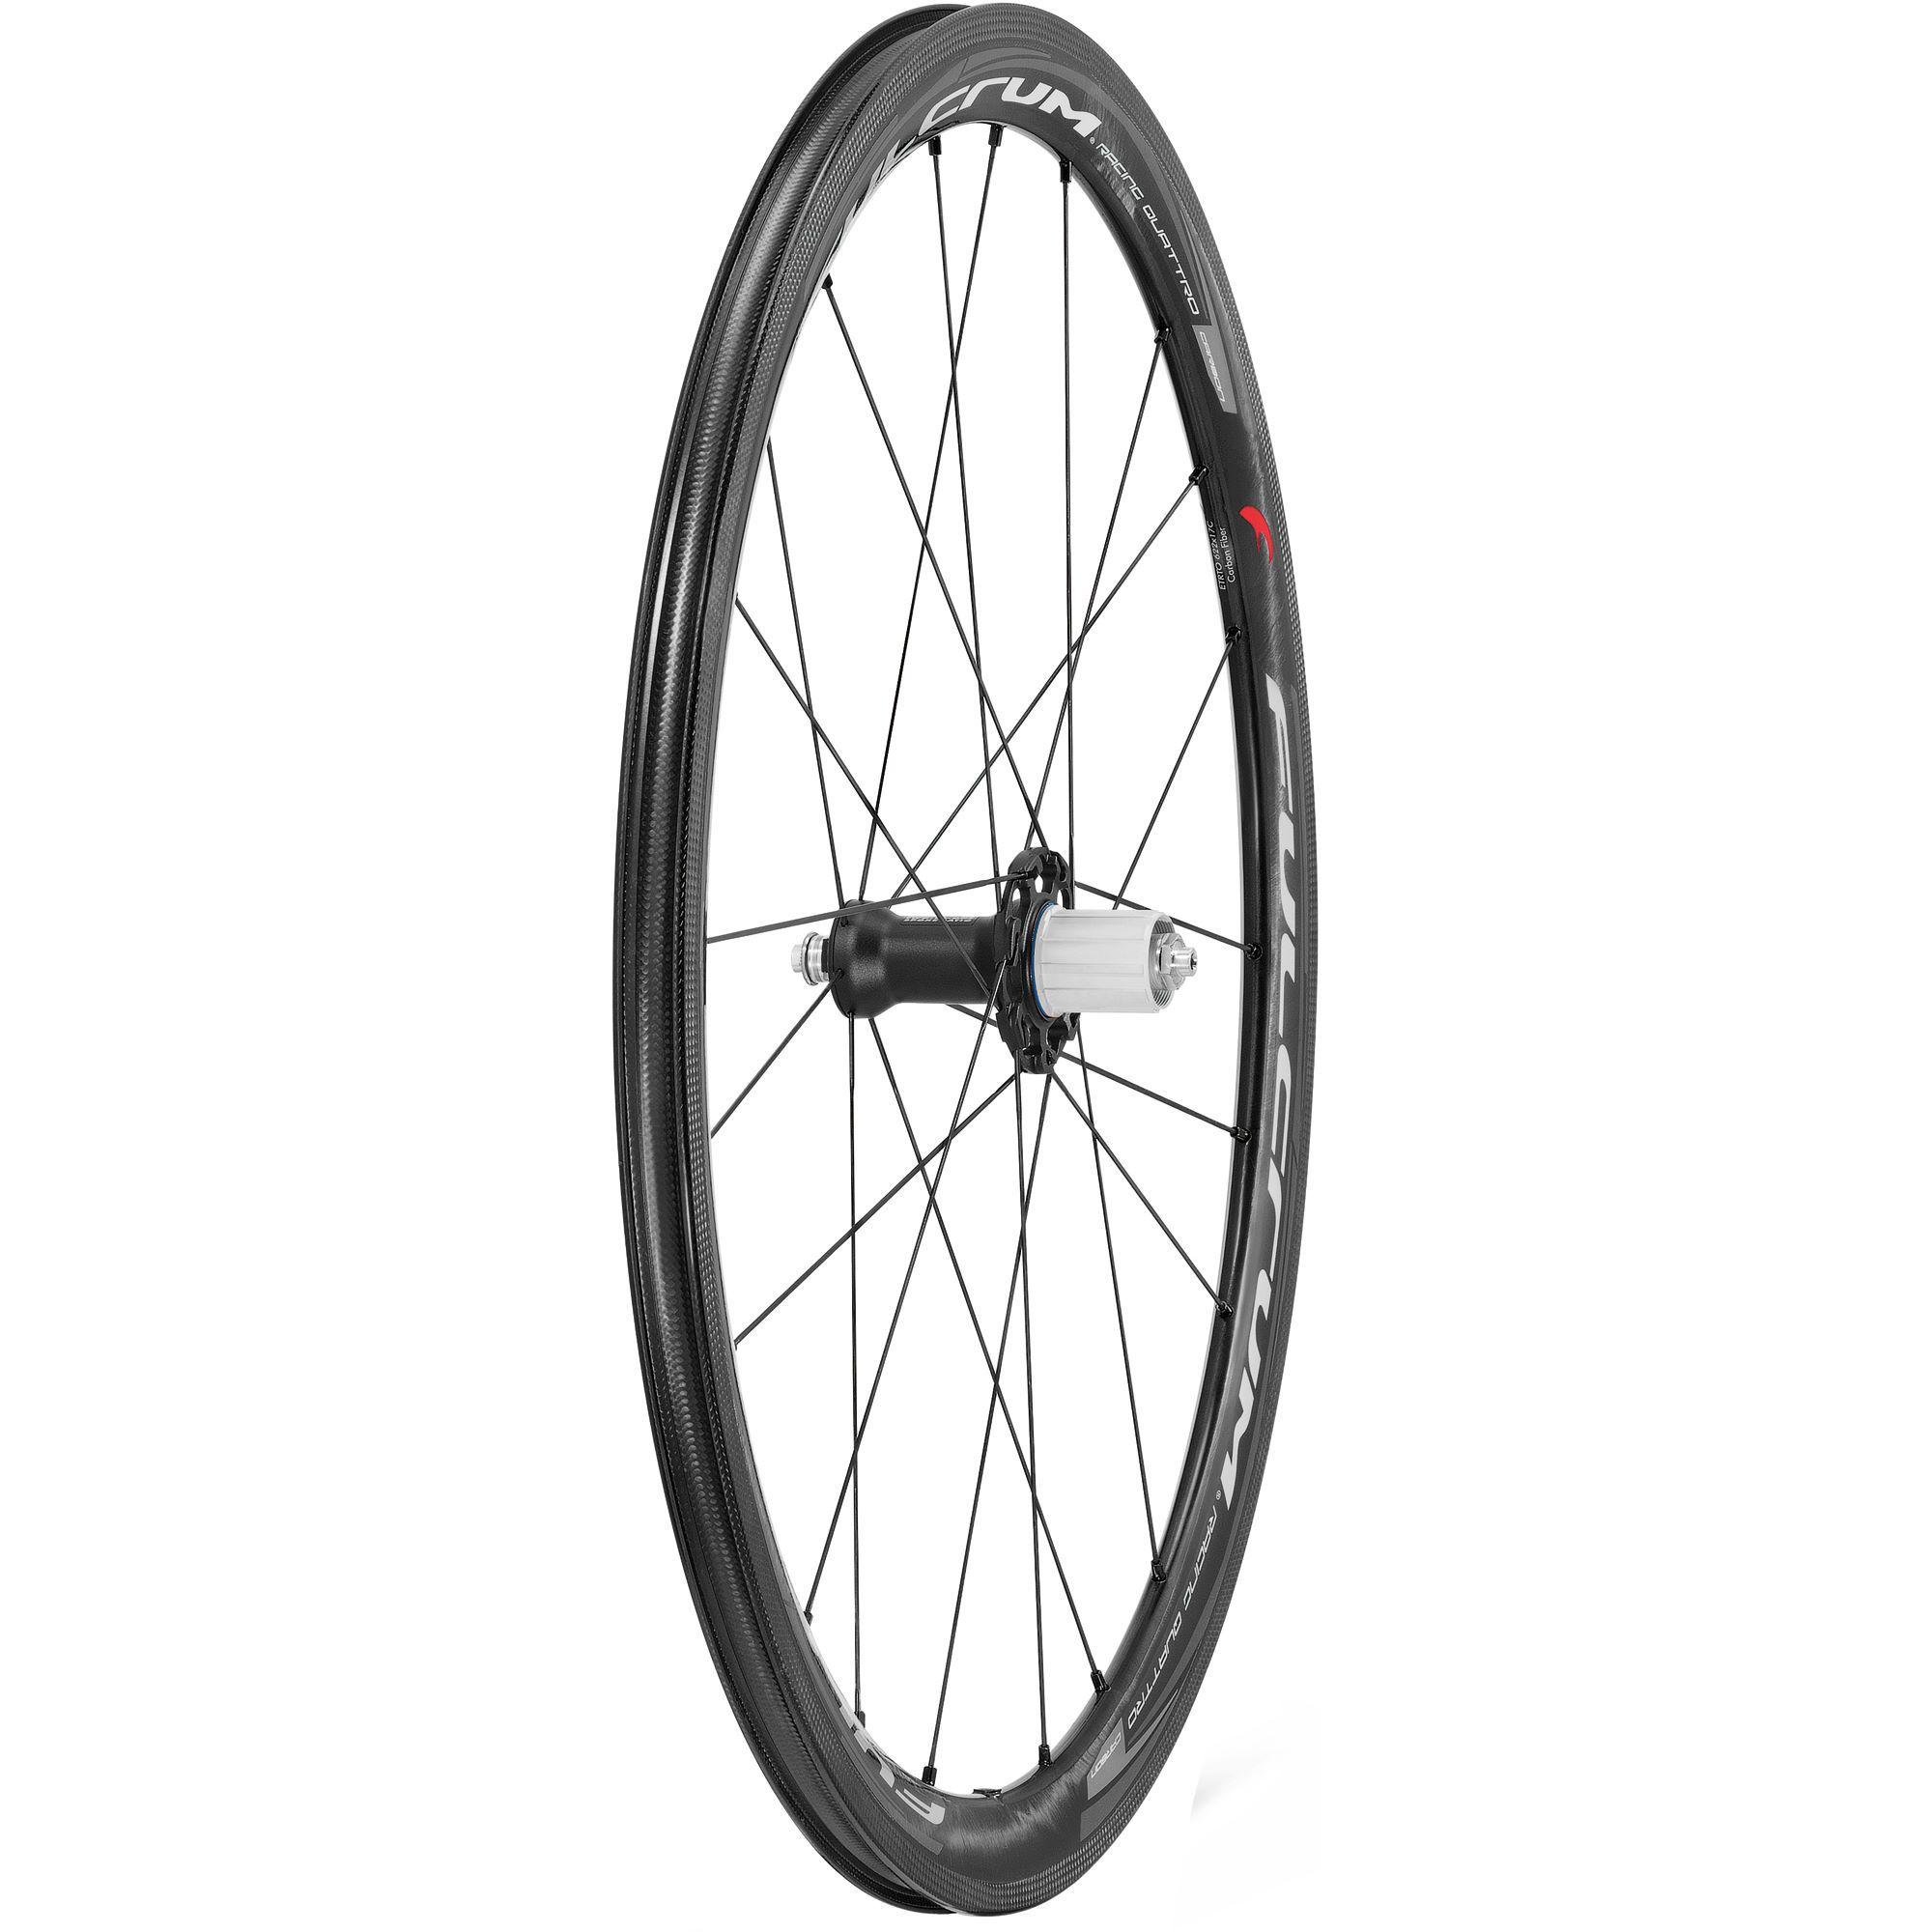 Fulcrum Racing Quattro Carbon Clincher Wheelset Performance Wheels Road Bike Wheels Bike Wheel Performance Wheels